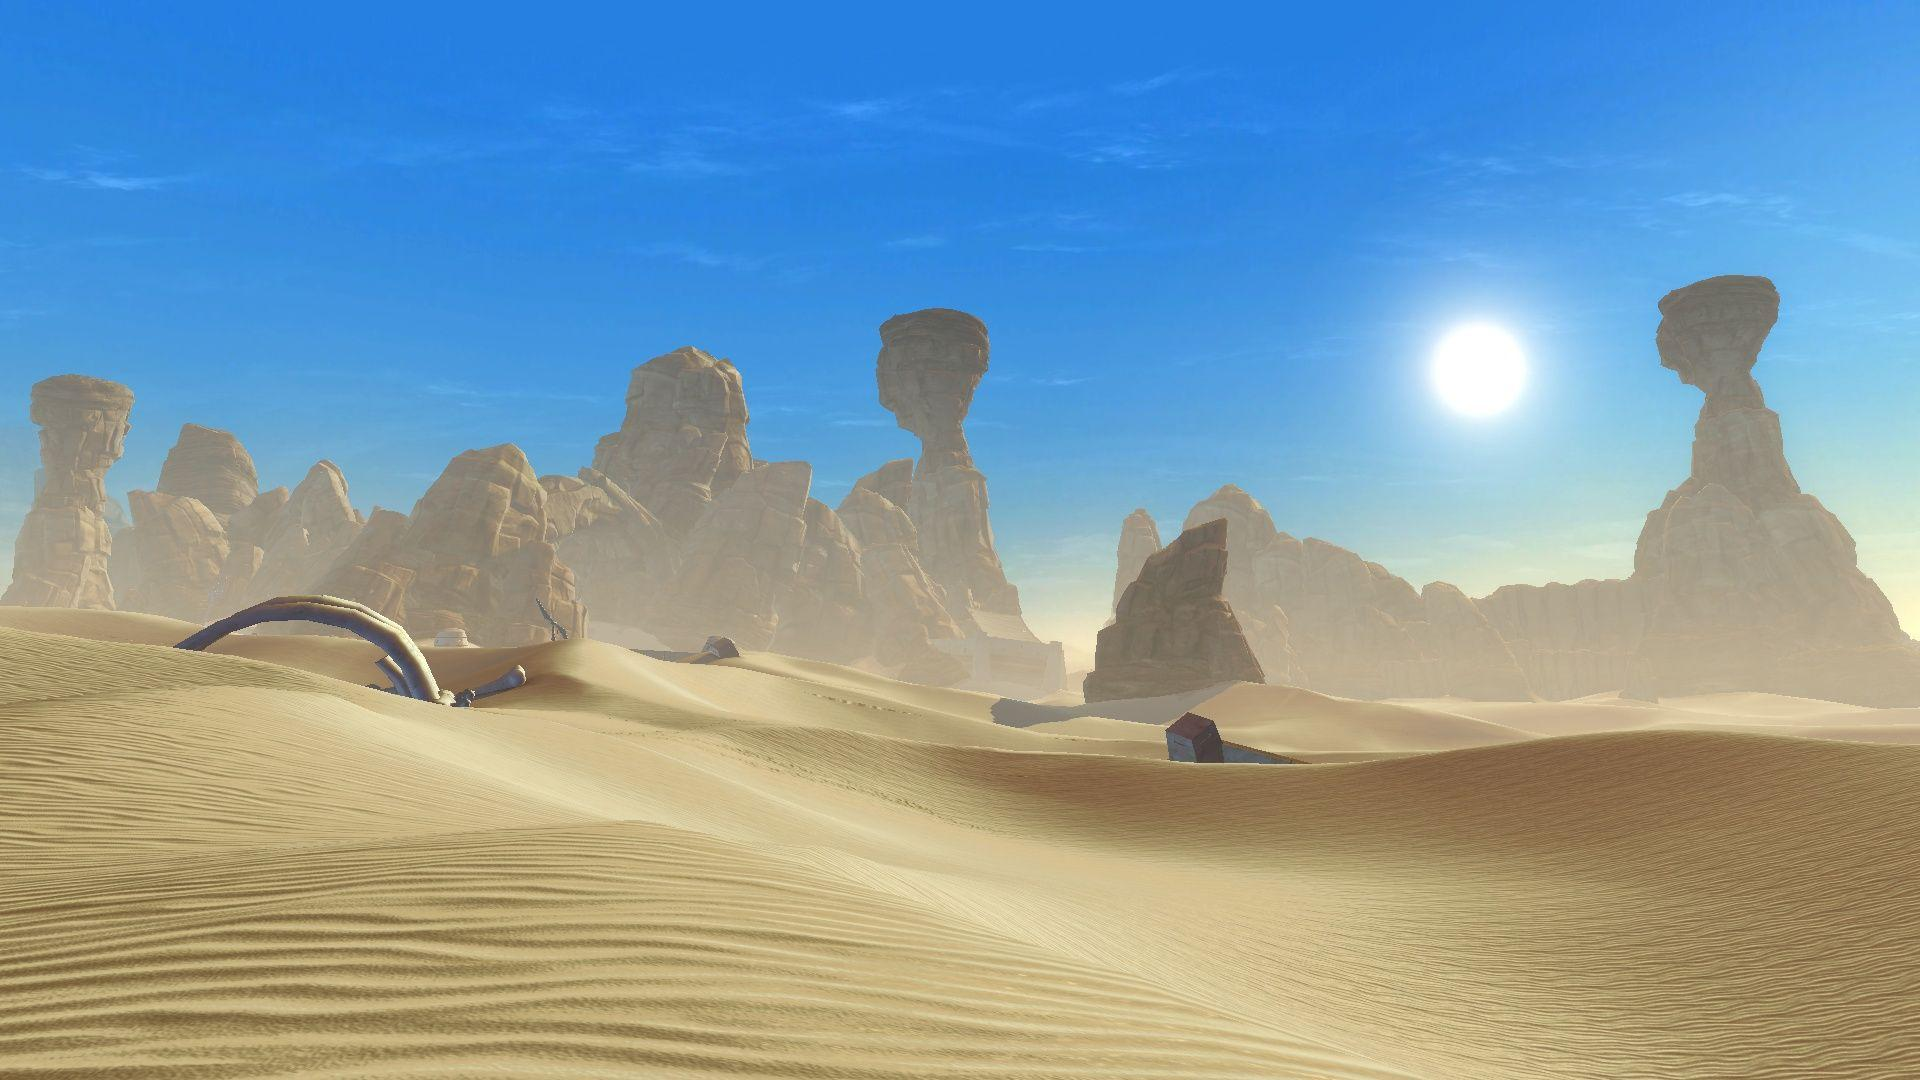 Star Wars Tatooine Desktop Wallpapers Wallpaper Cave